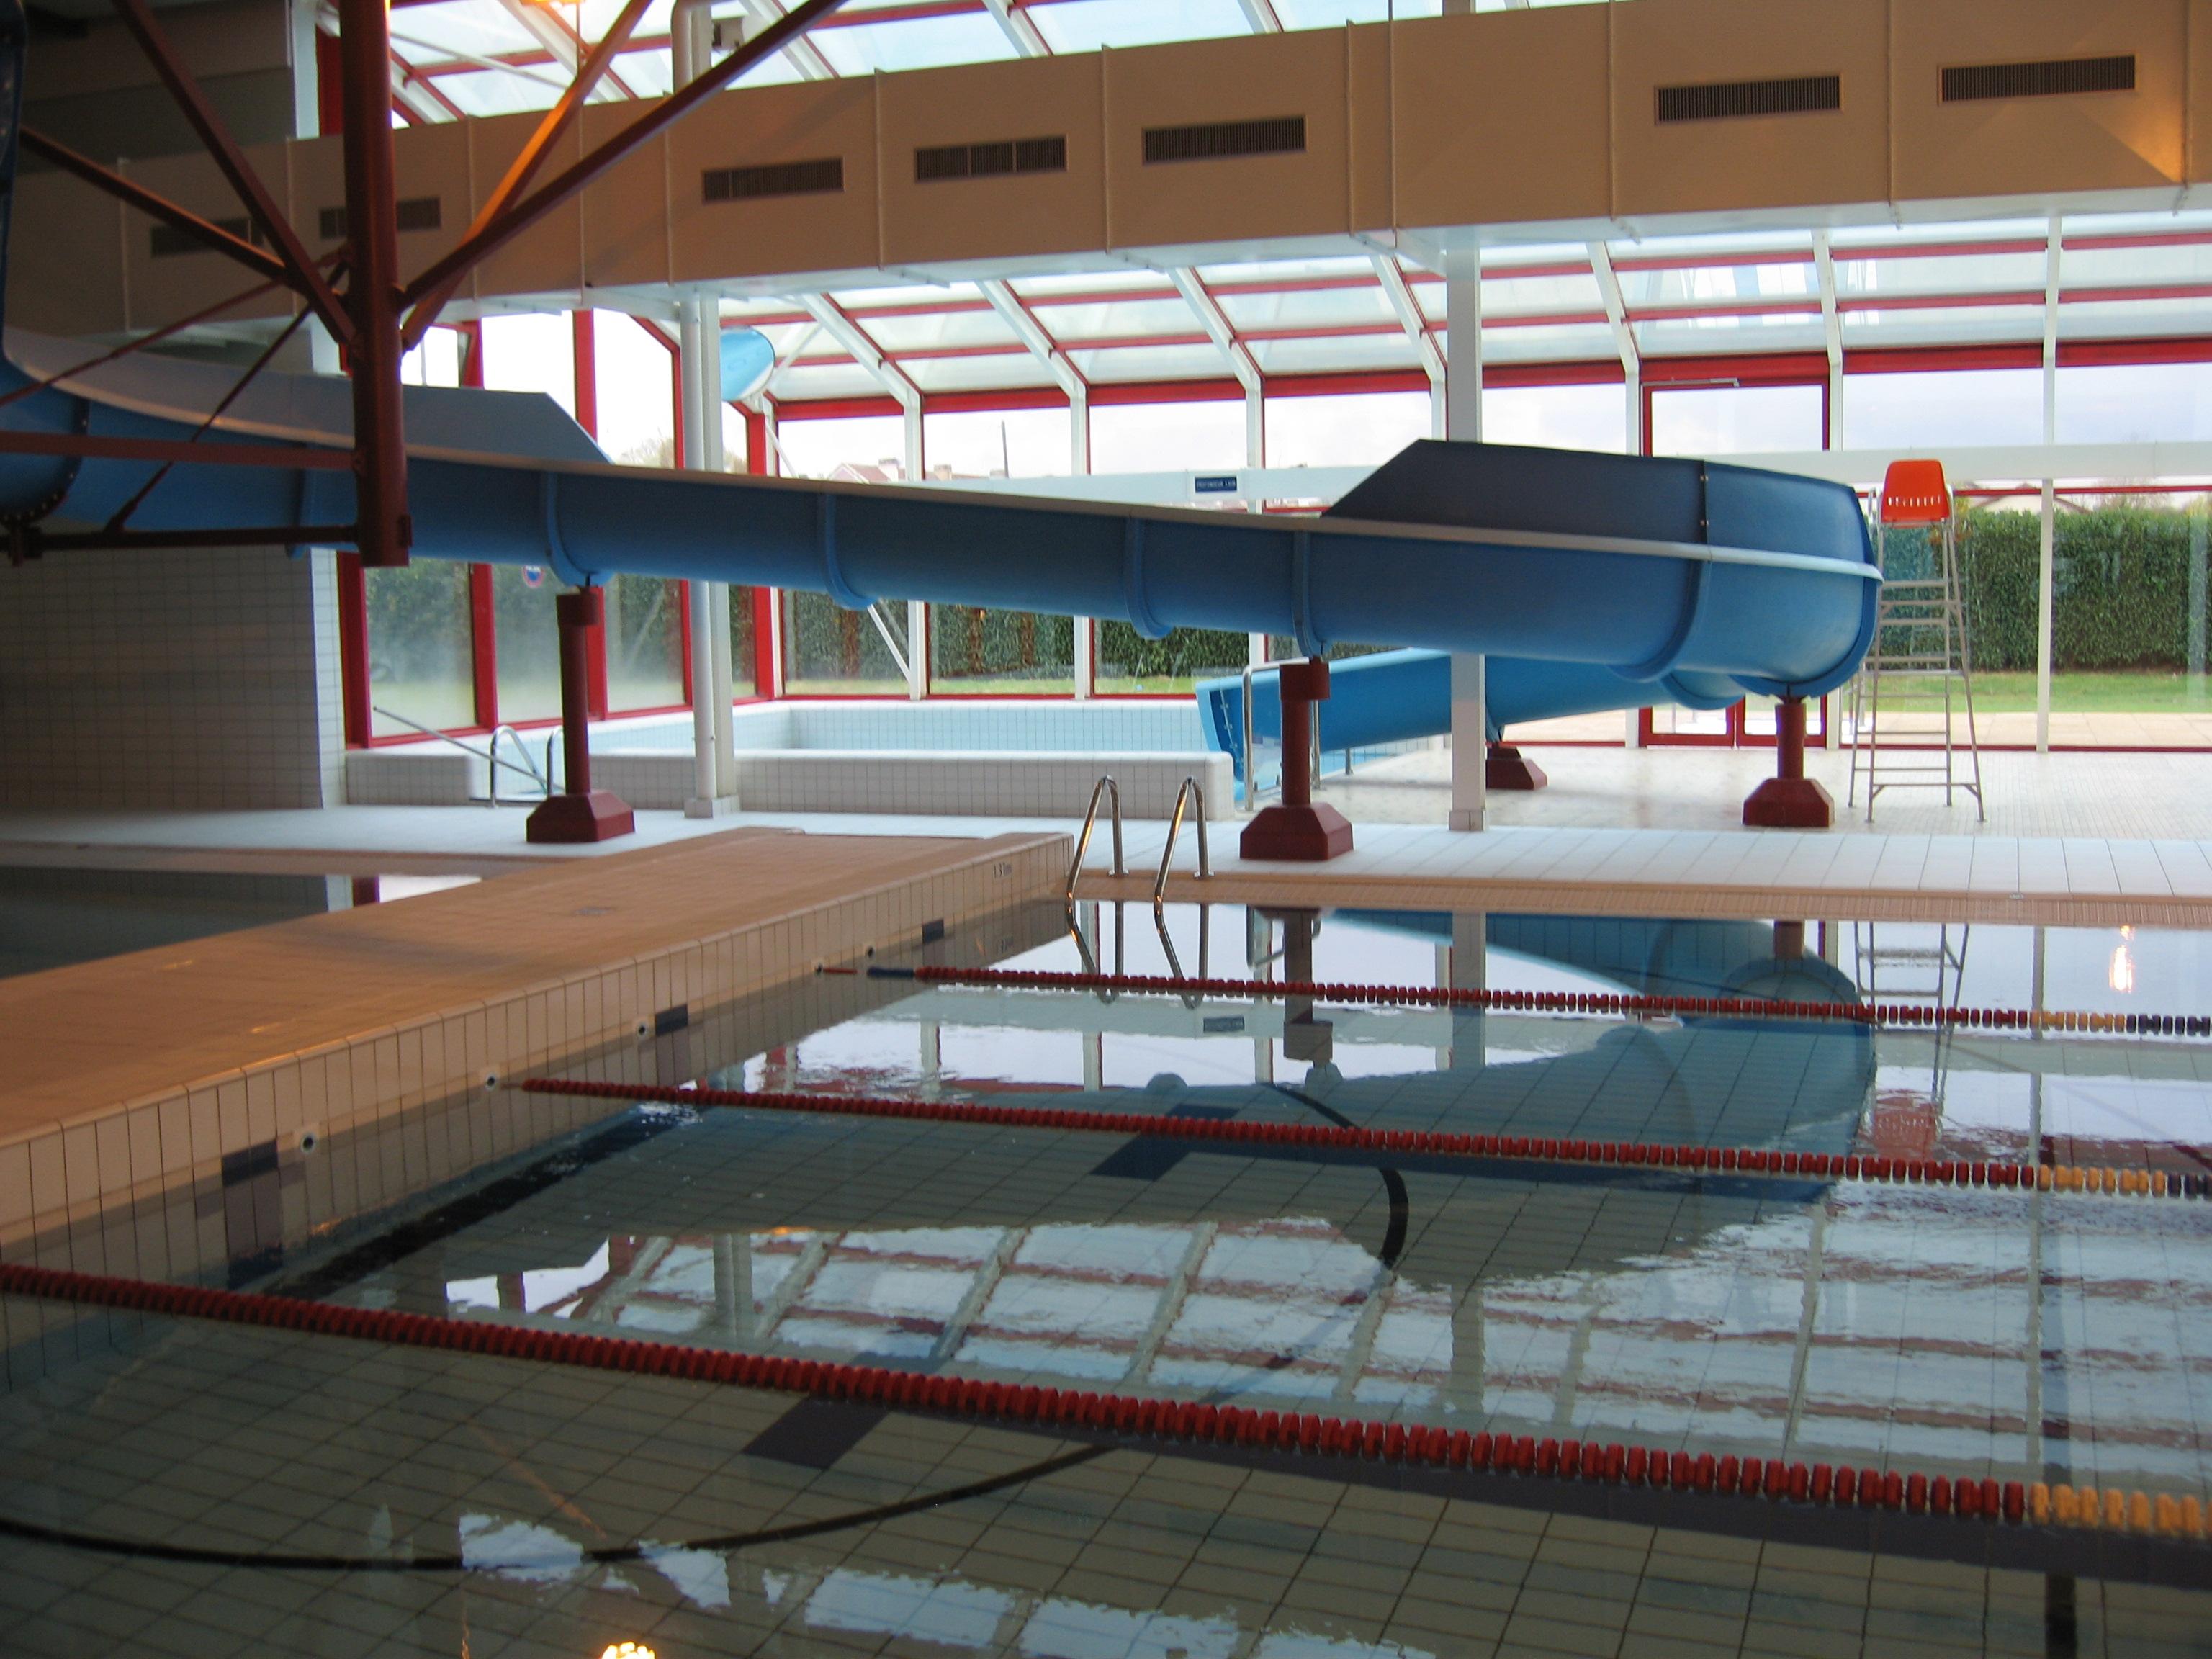 Travaux de la piscine de fontenay tr signy terrasse en bois for Travaux piscine